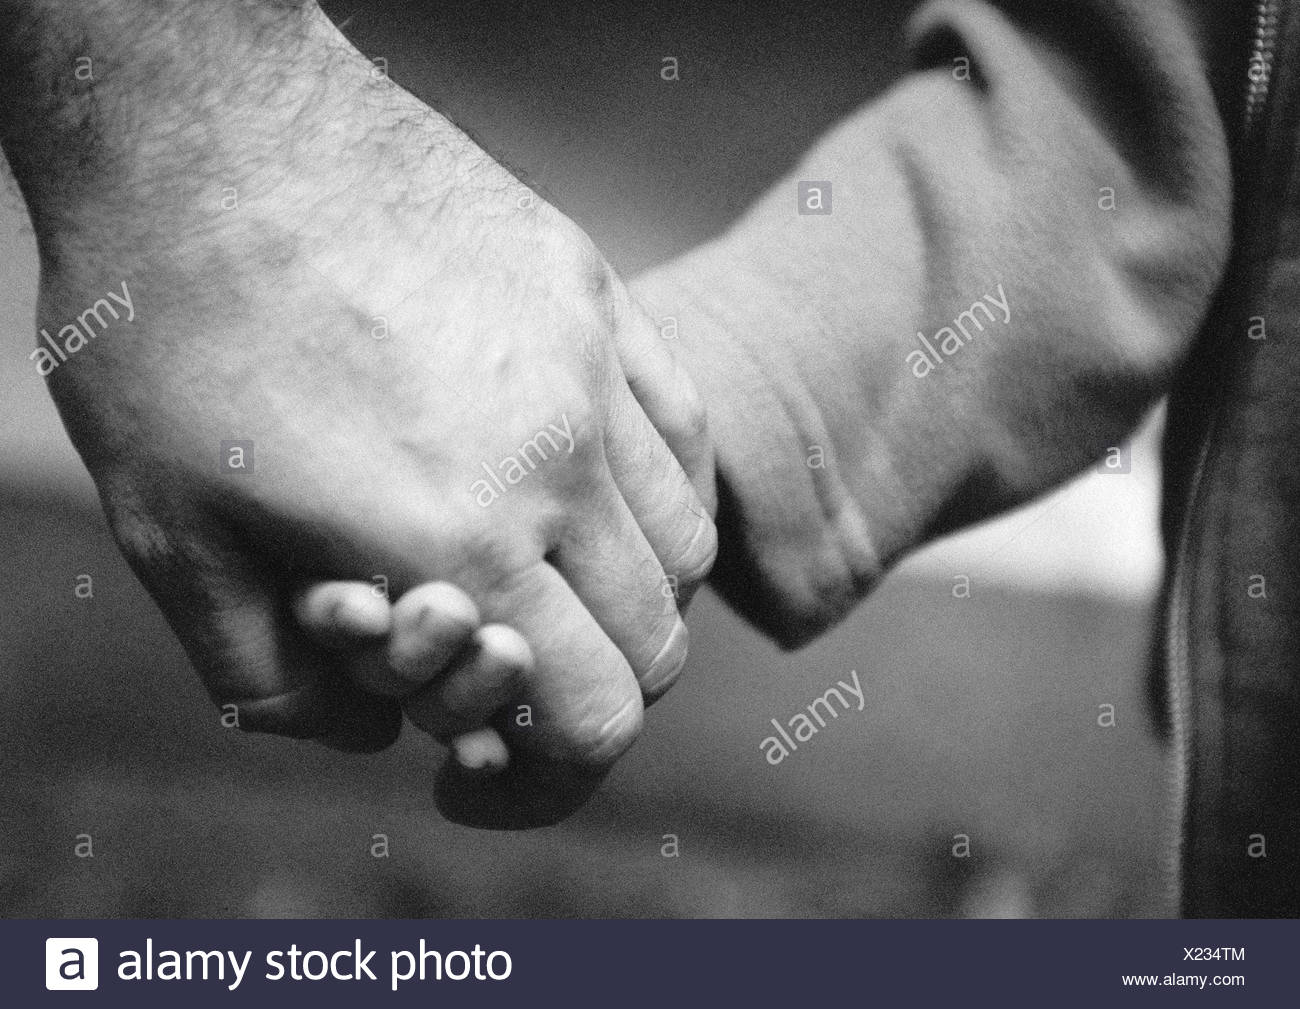 Erwachsenen Hand Holding Kind die hand, Nahaufnahme, b&w Stockbild